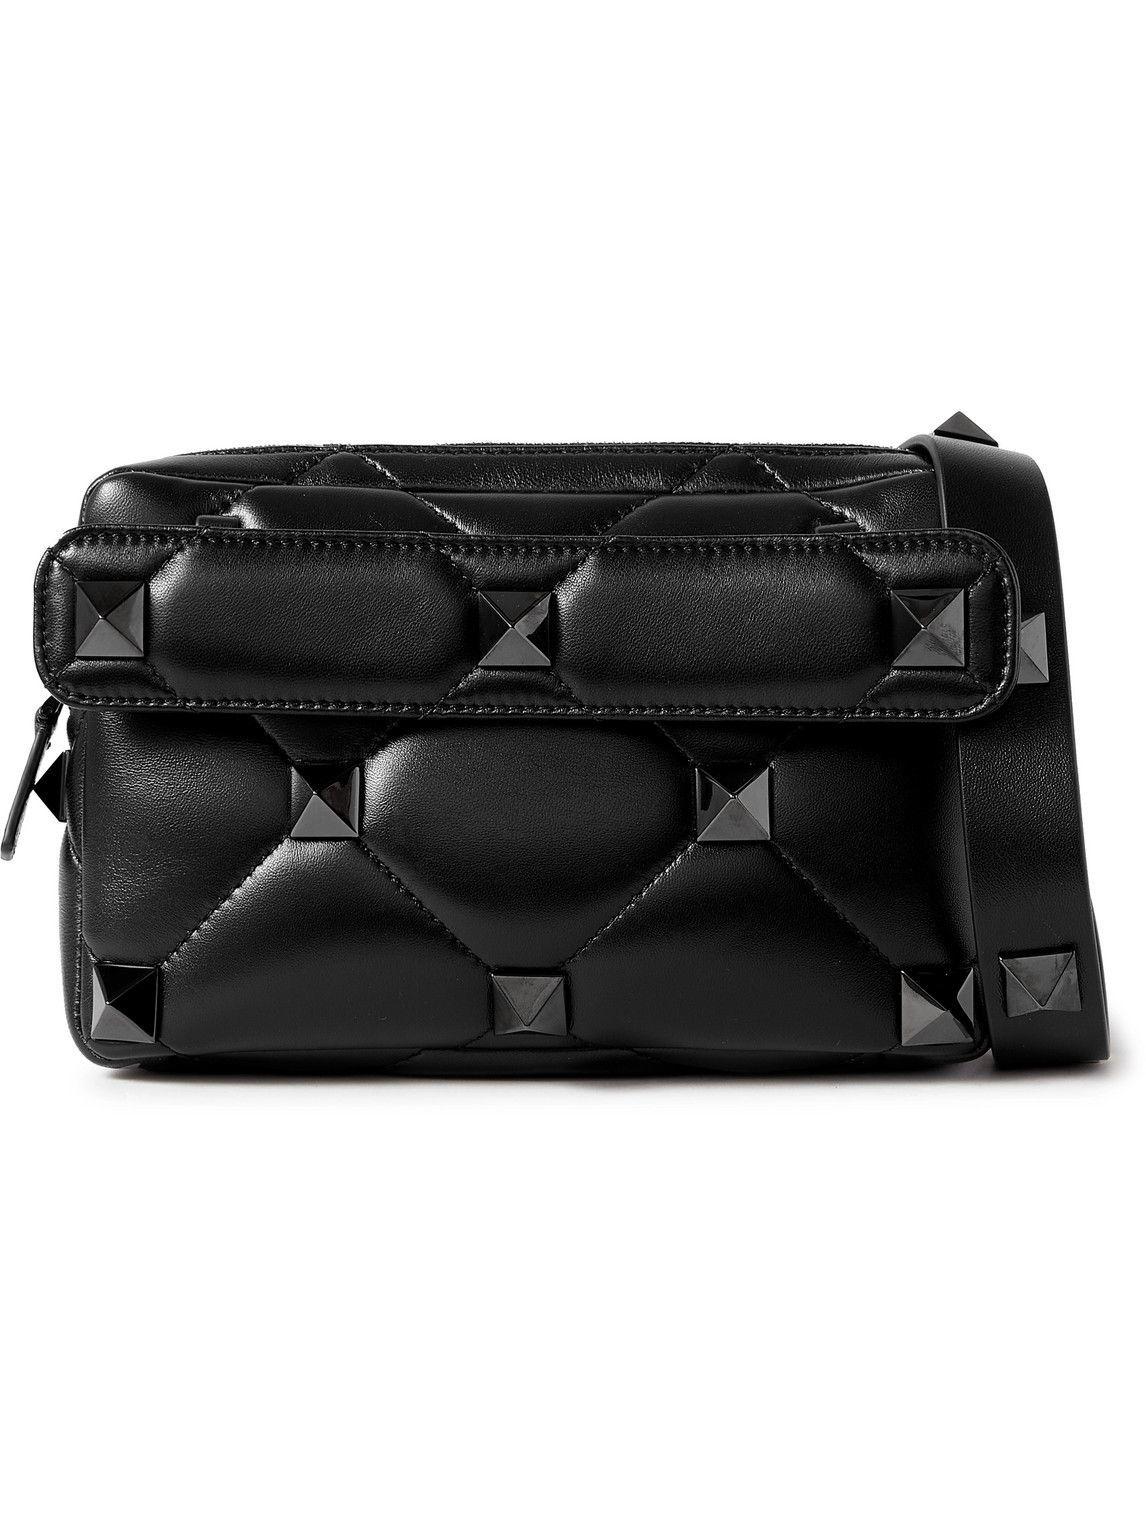 Photo: Valentino - Valentino Garavani Roman Stud Quilted Leather Messenger Bag